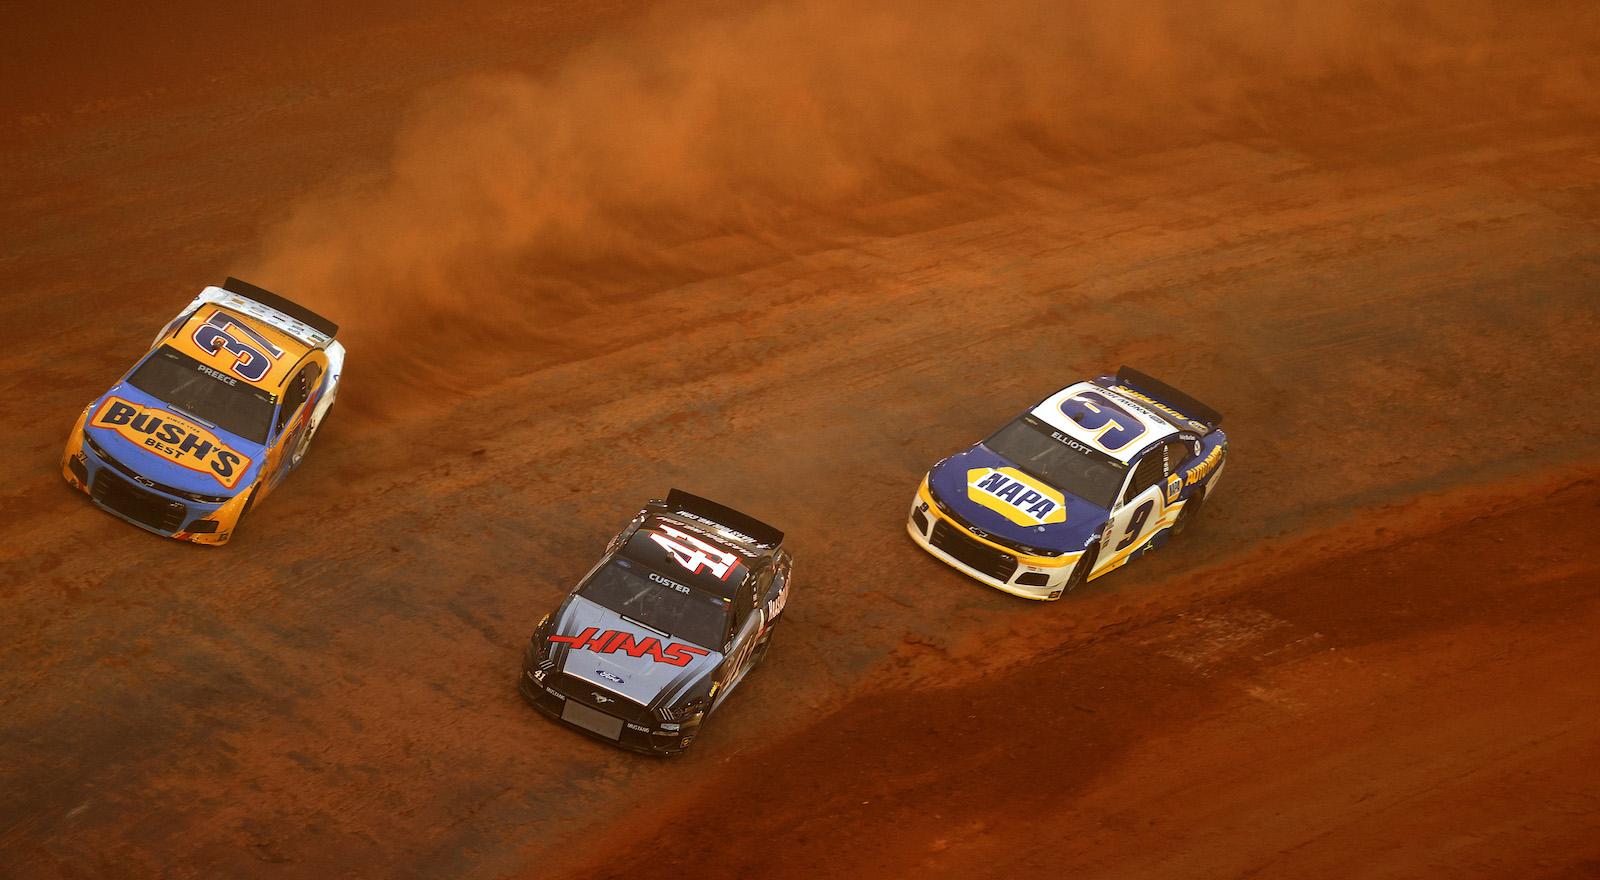 Historical dirt race at Bristol Motor Speedway delayed until Monday - Motorsport Week